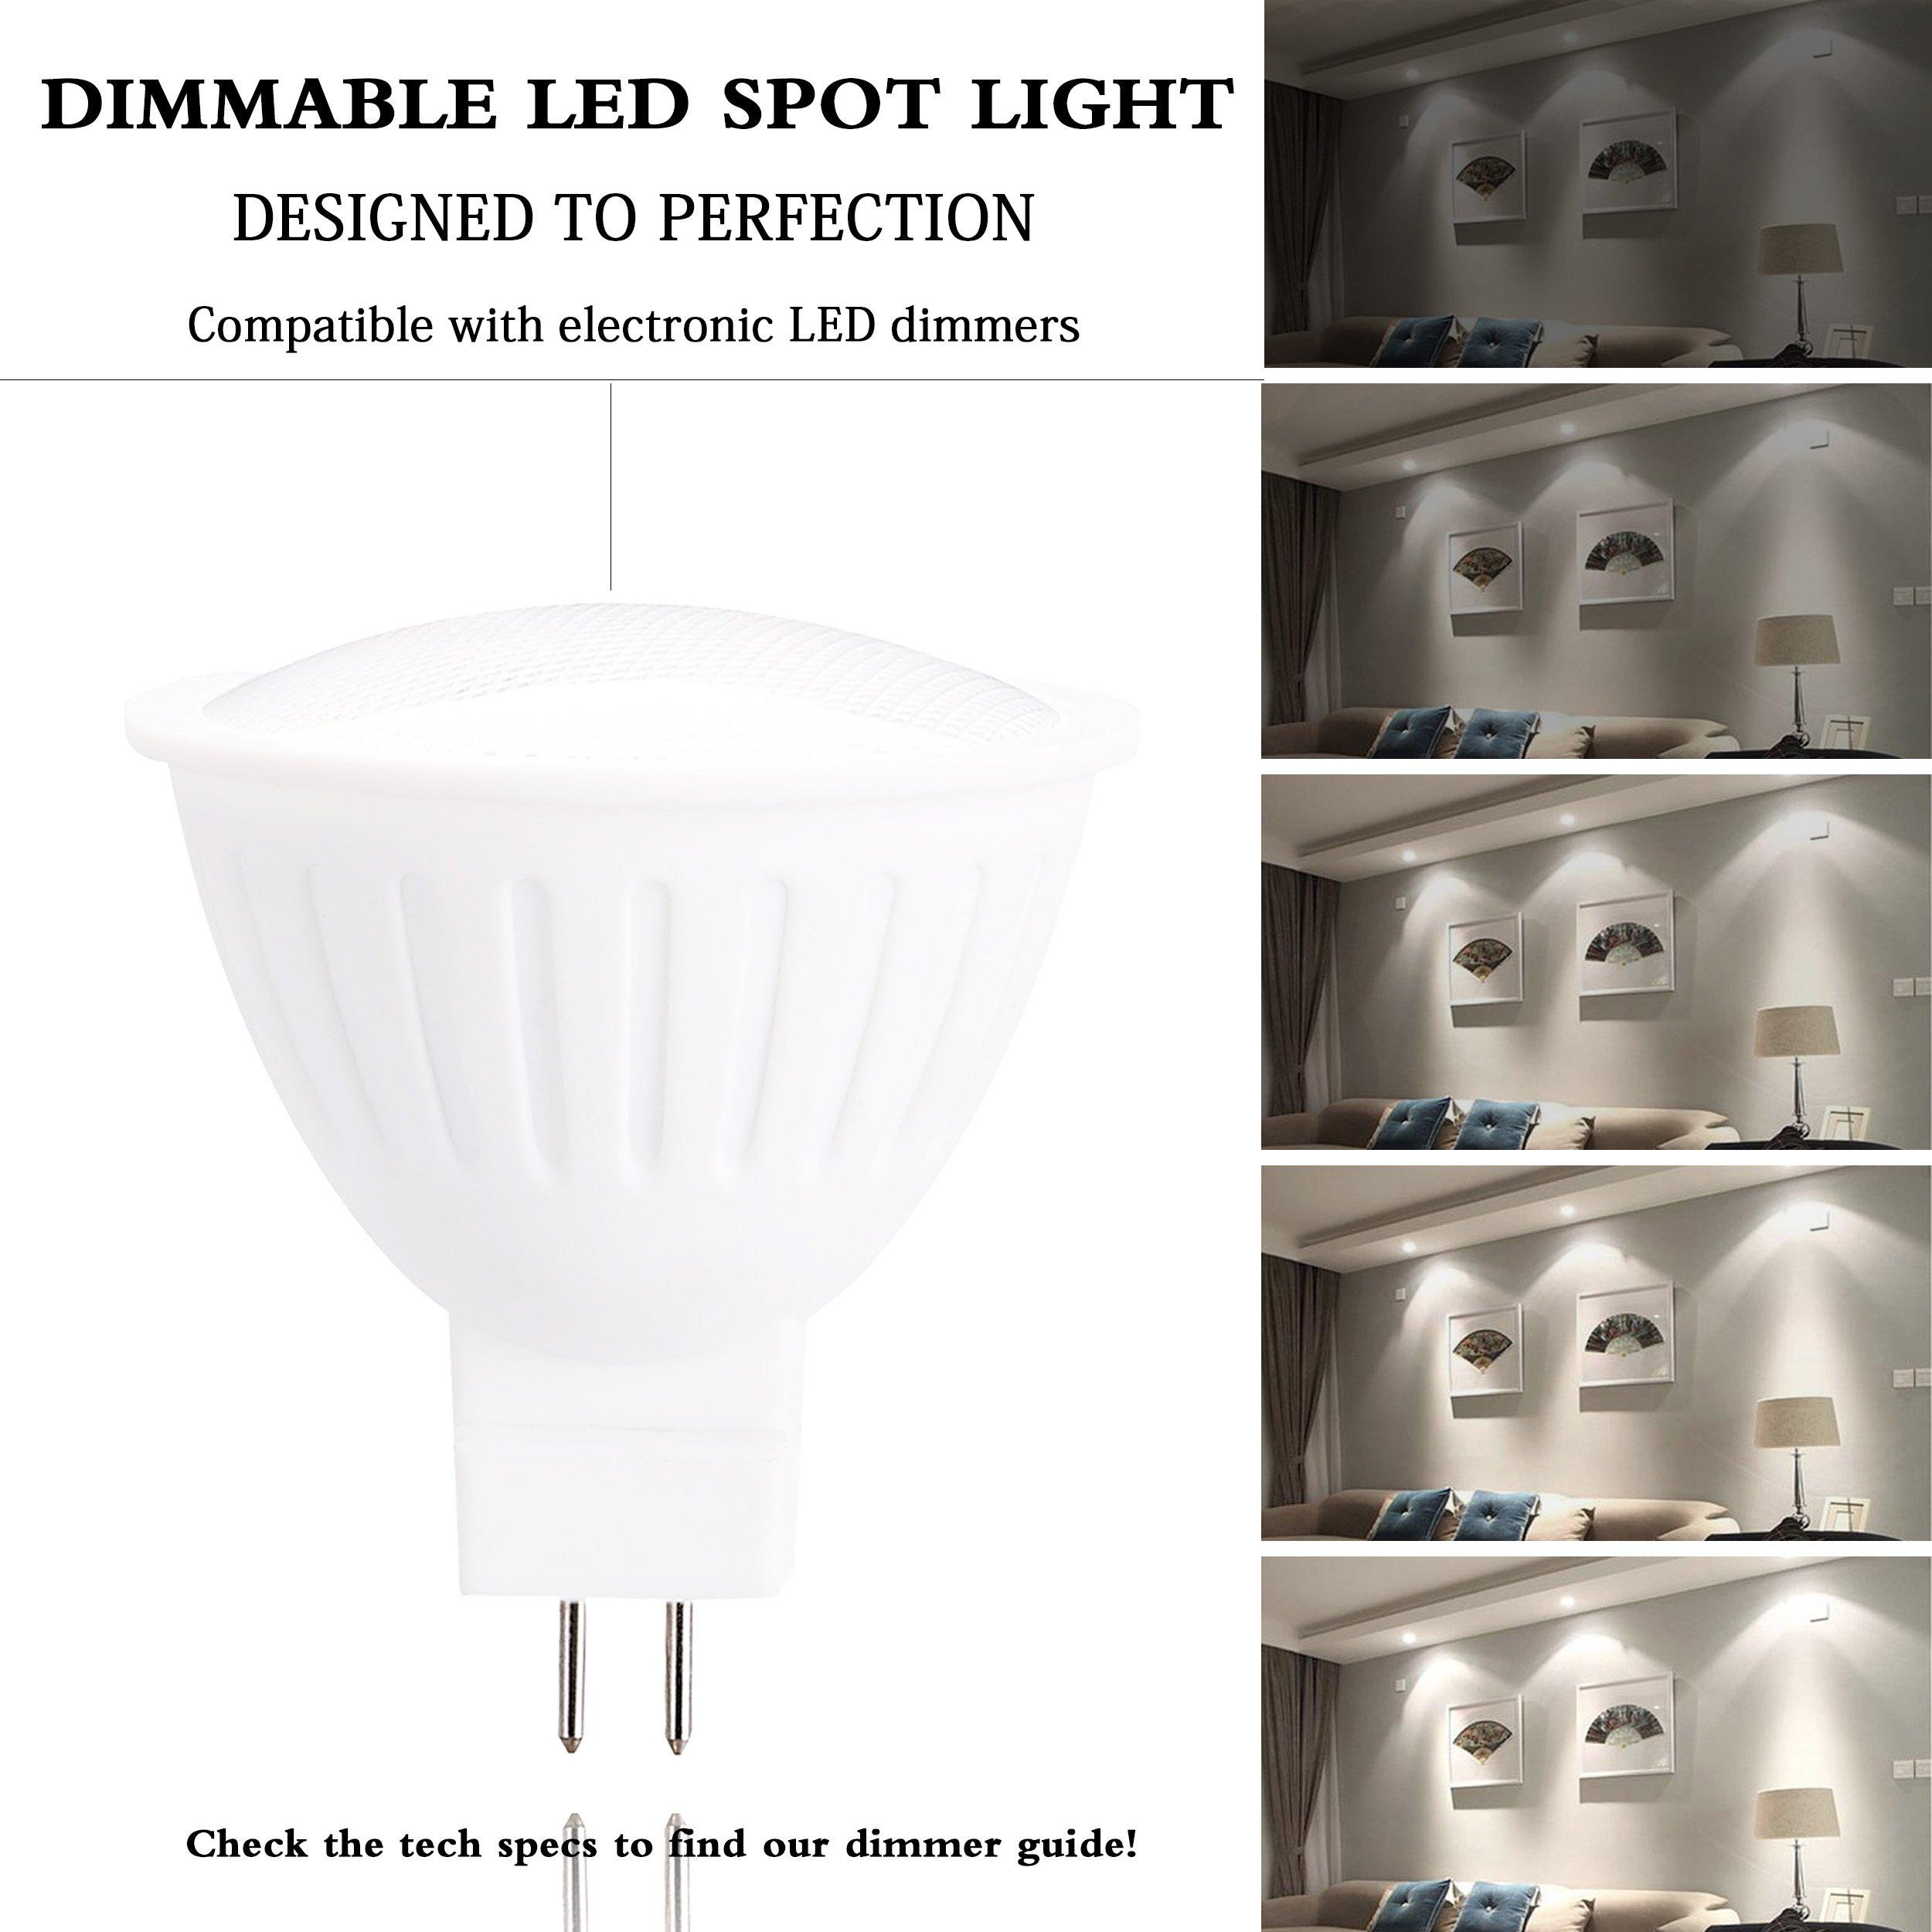 120 Voltage MR16/GU5.3 LED Bulb, 5Watt (50 Watt Halogen Bulbs Equivalence) 500 Lumen Floodlight, GU5.3 Bi-Pin Small Base, Dimmable 120° Beam Angle 4000K Natural White Plug-in Recessed Bulb (6 Pack)